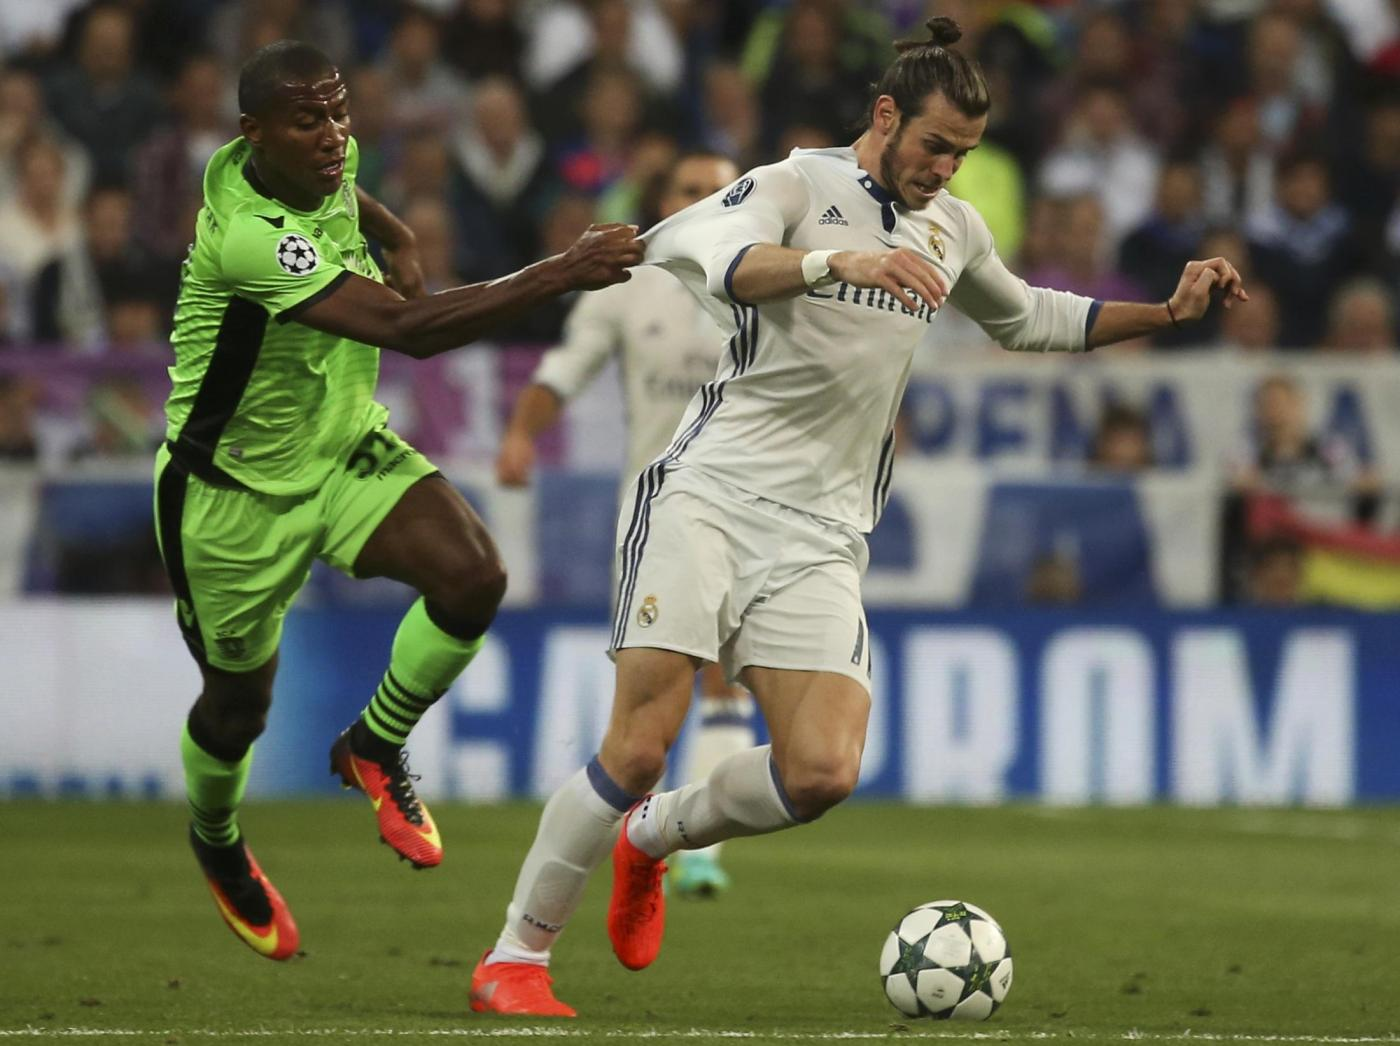 Real Madrid vs Sporting Portugal UEFA Champions League 2016 2017